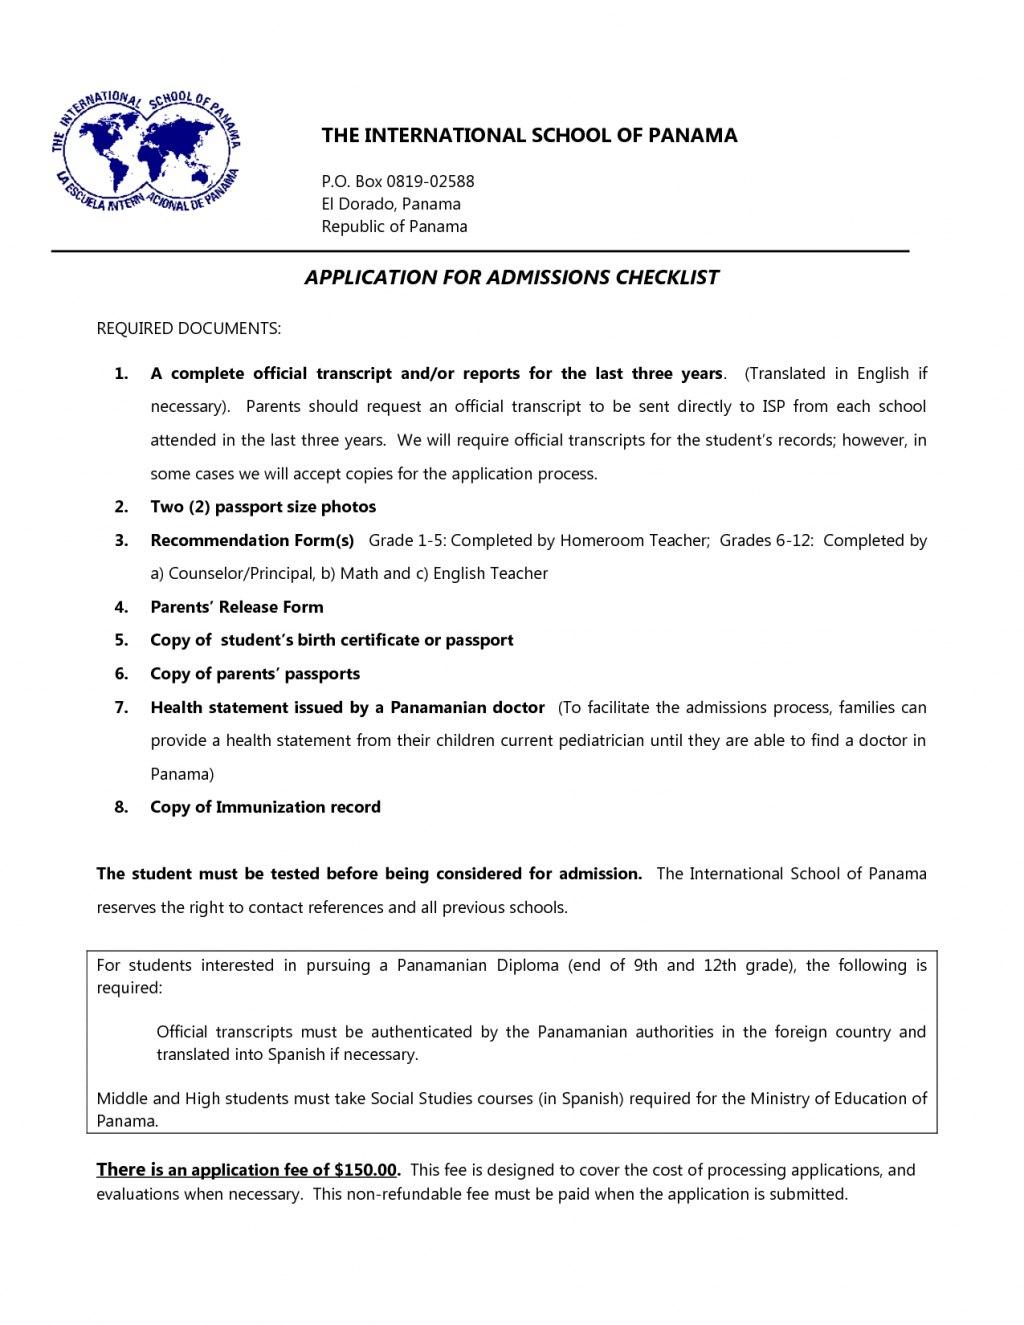 Death Certificate Translation Template Spanish To English Translate Pertaining To Spanish To English Birth Certificate Translation Template